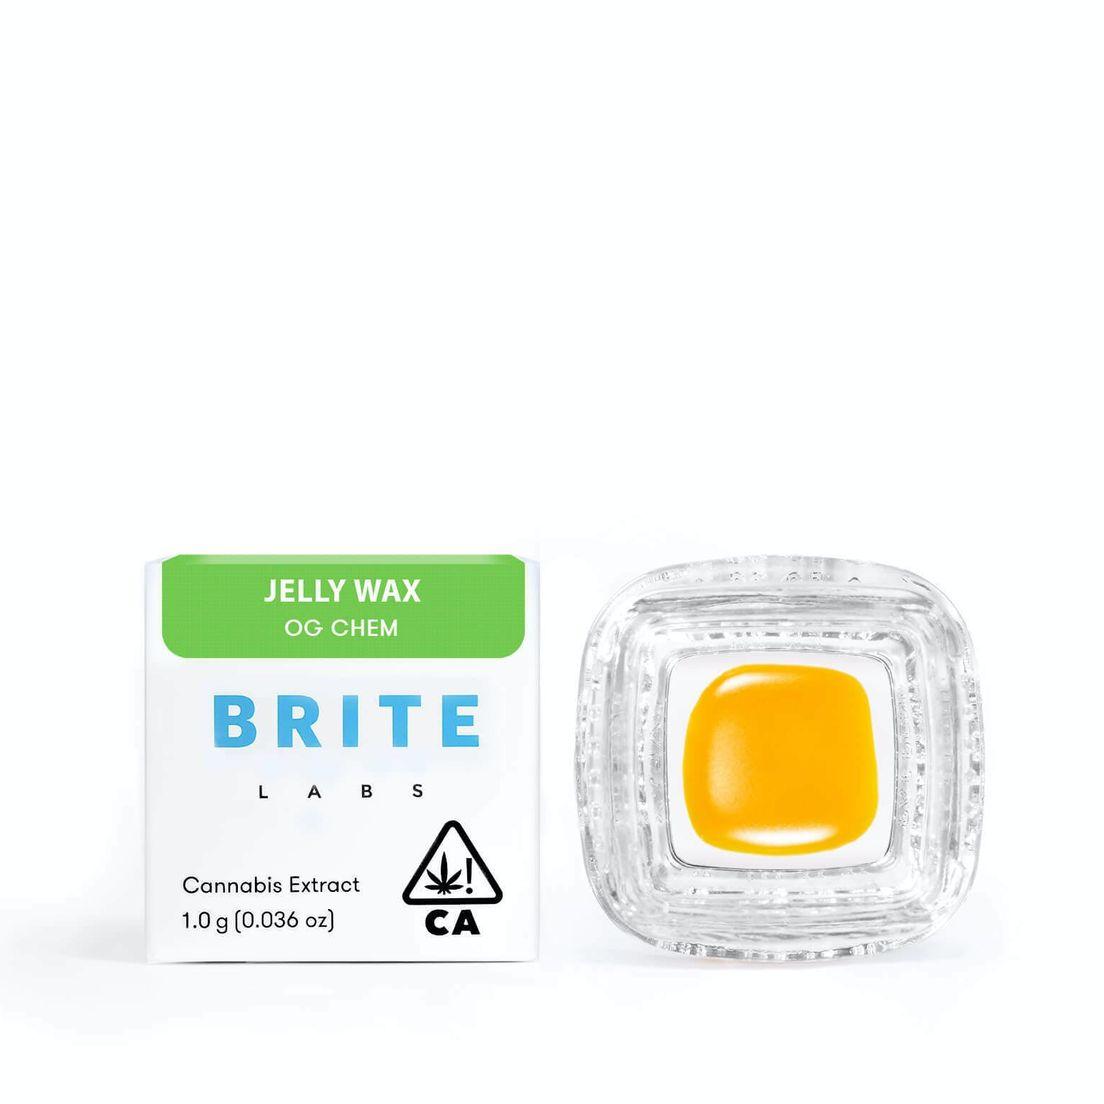 Brite Labs OG Chem 1g Jelly Wax 82.4%